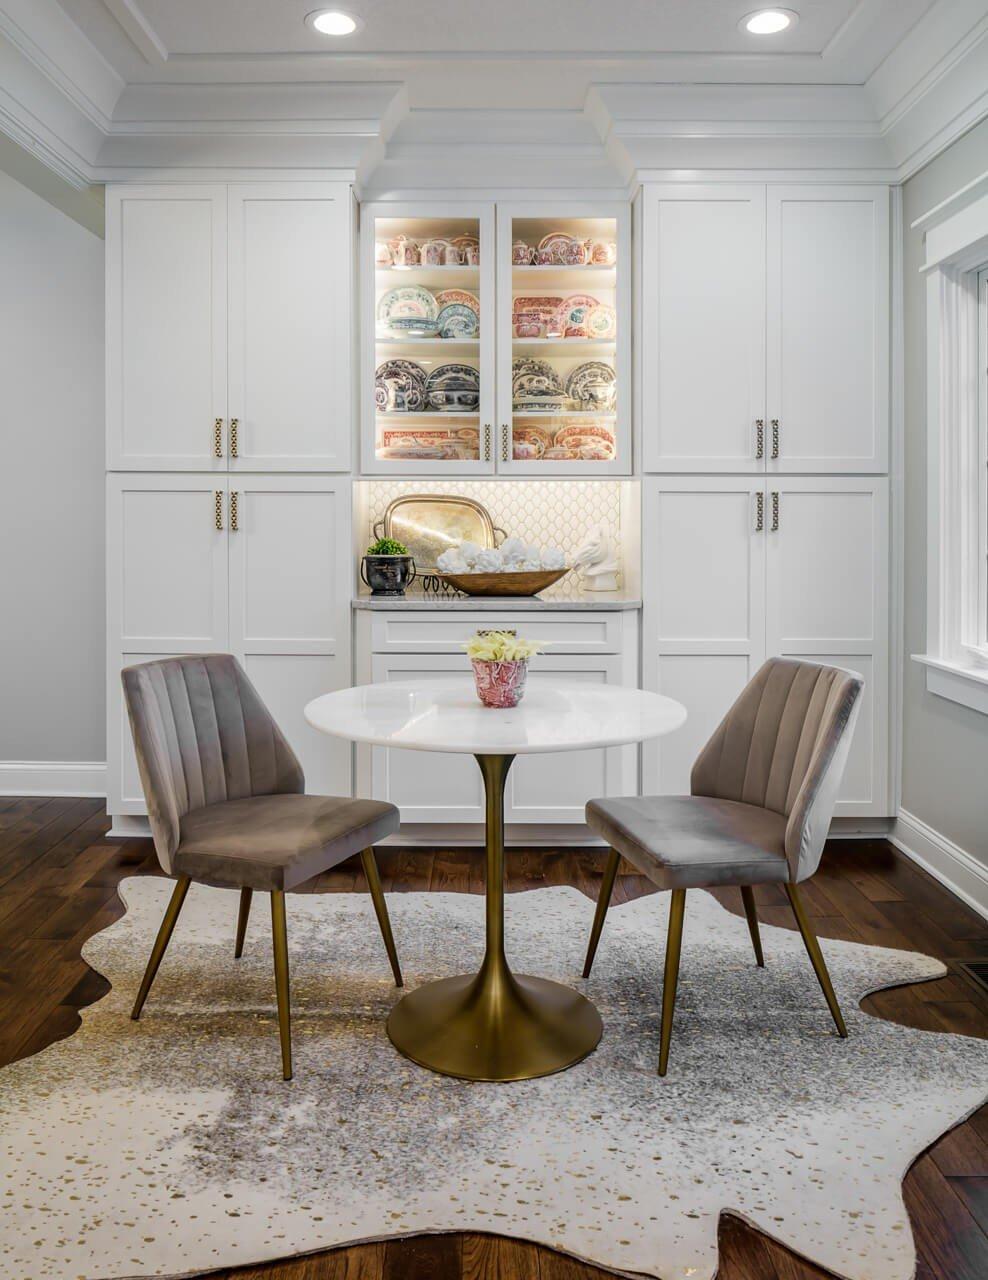 Great custom cabinets